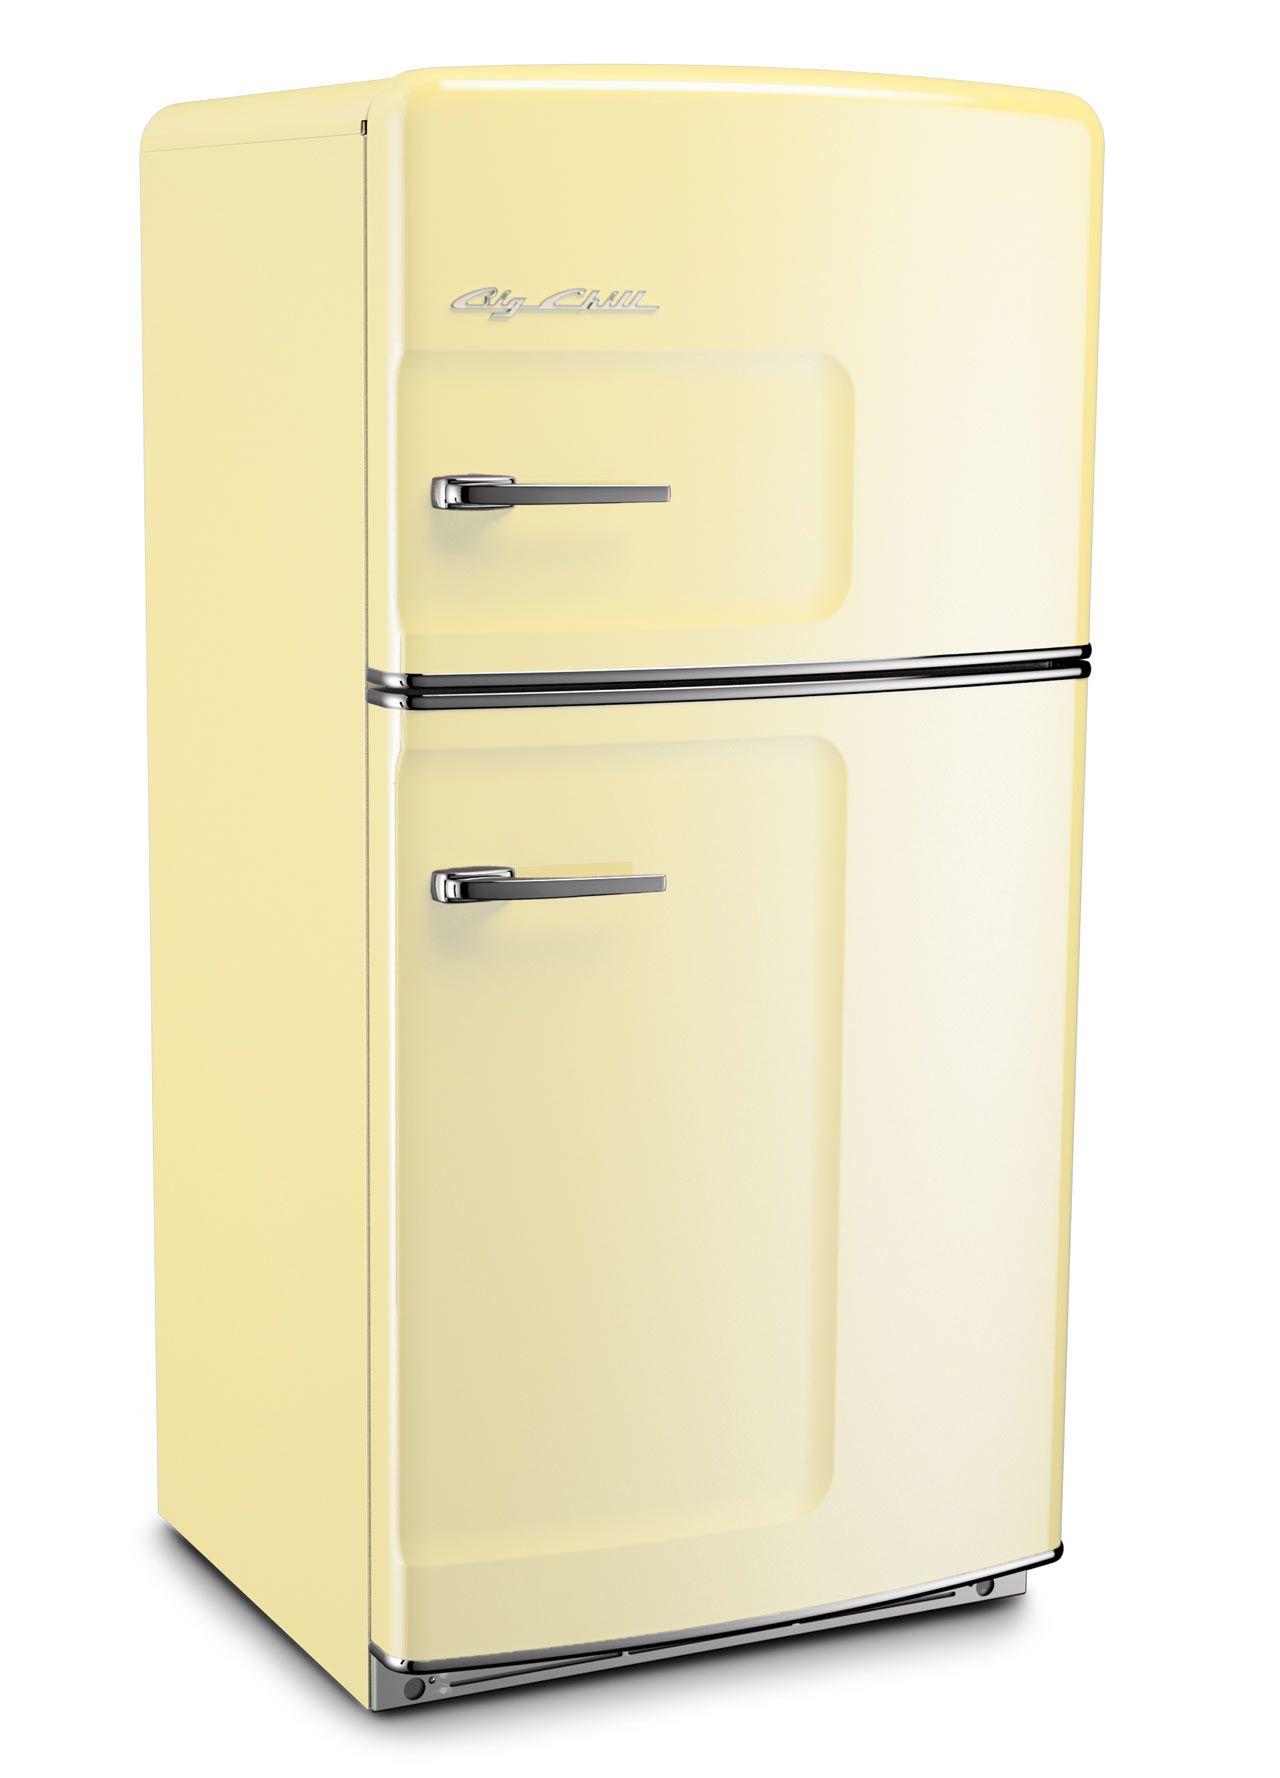 How Big Chill S Retro Fridge Came To Be Design Milk Big Chill Appliances Retro Refrigerator Retro Fridge